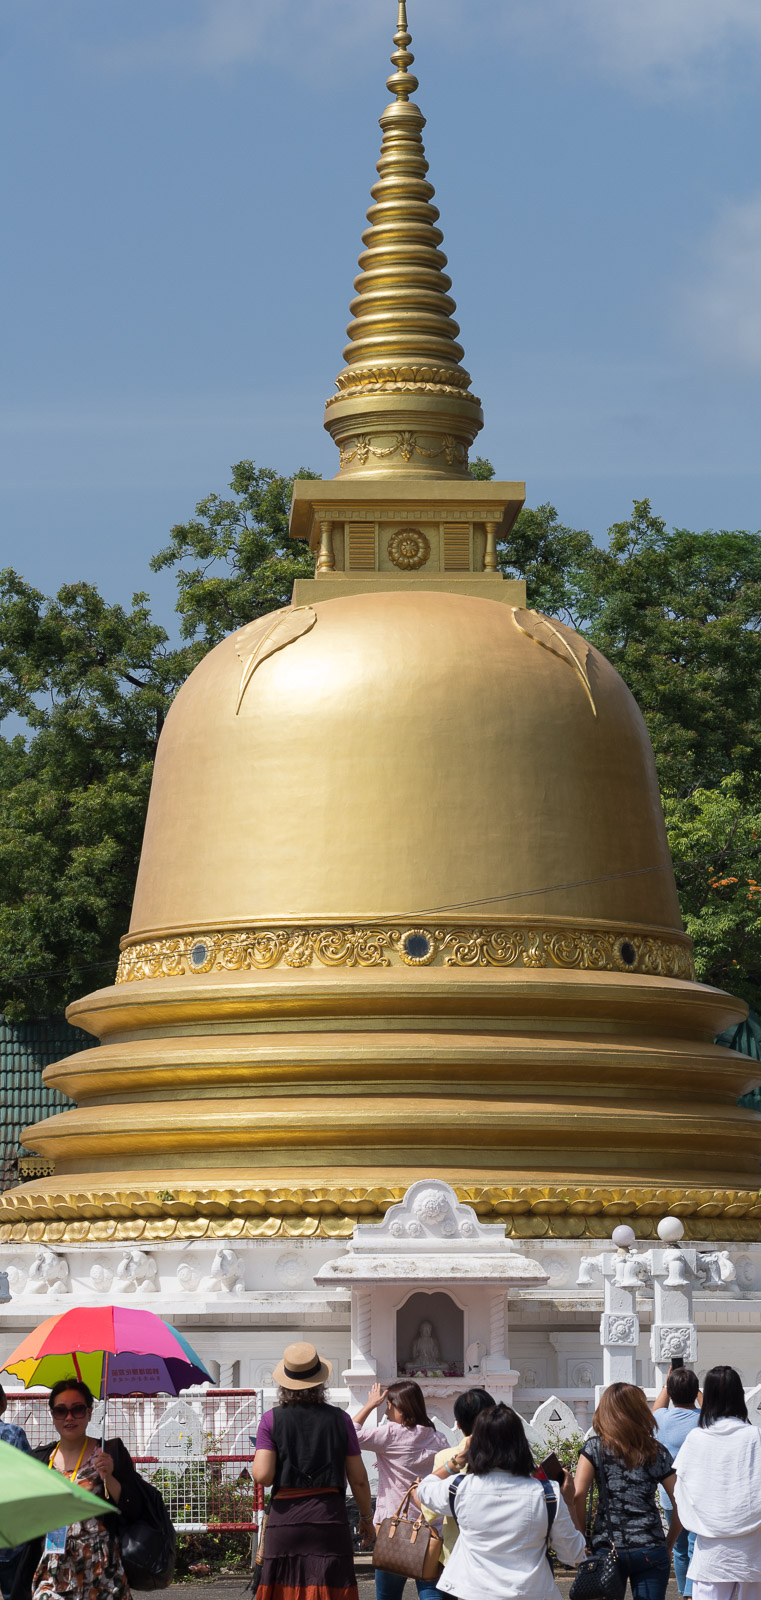 20160703-sri lanka-1279-Pano